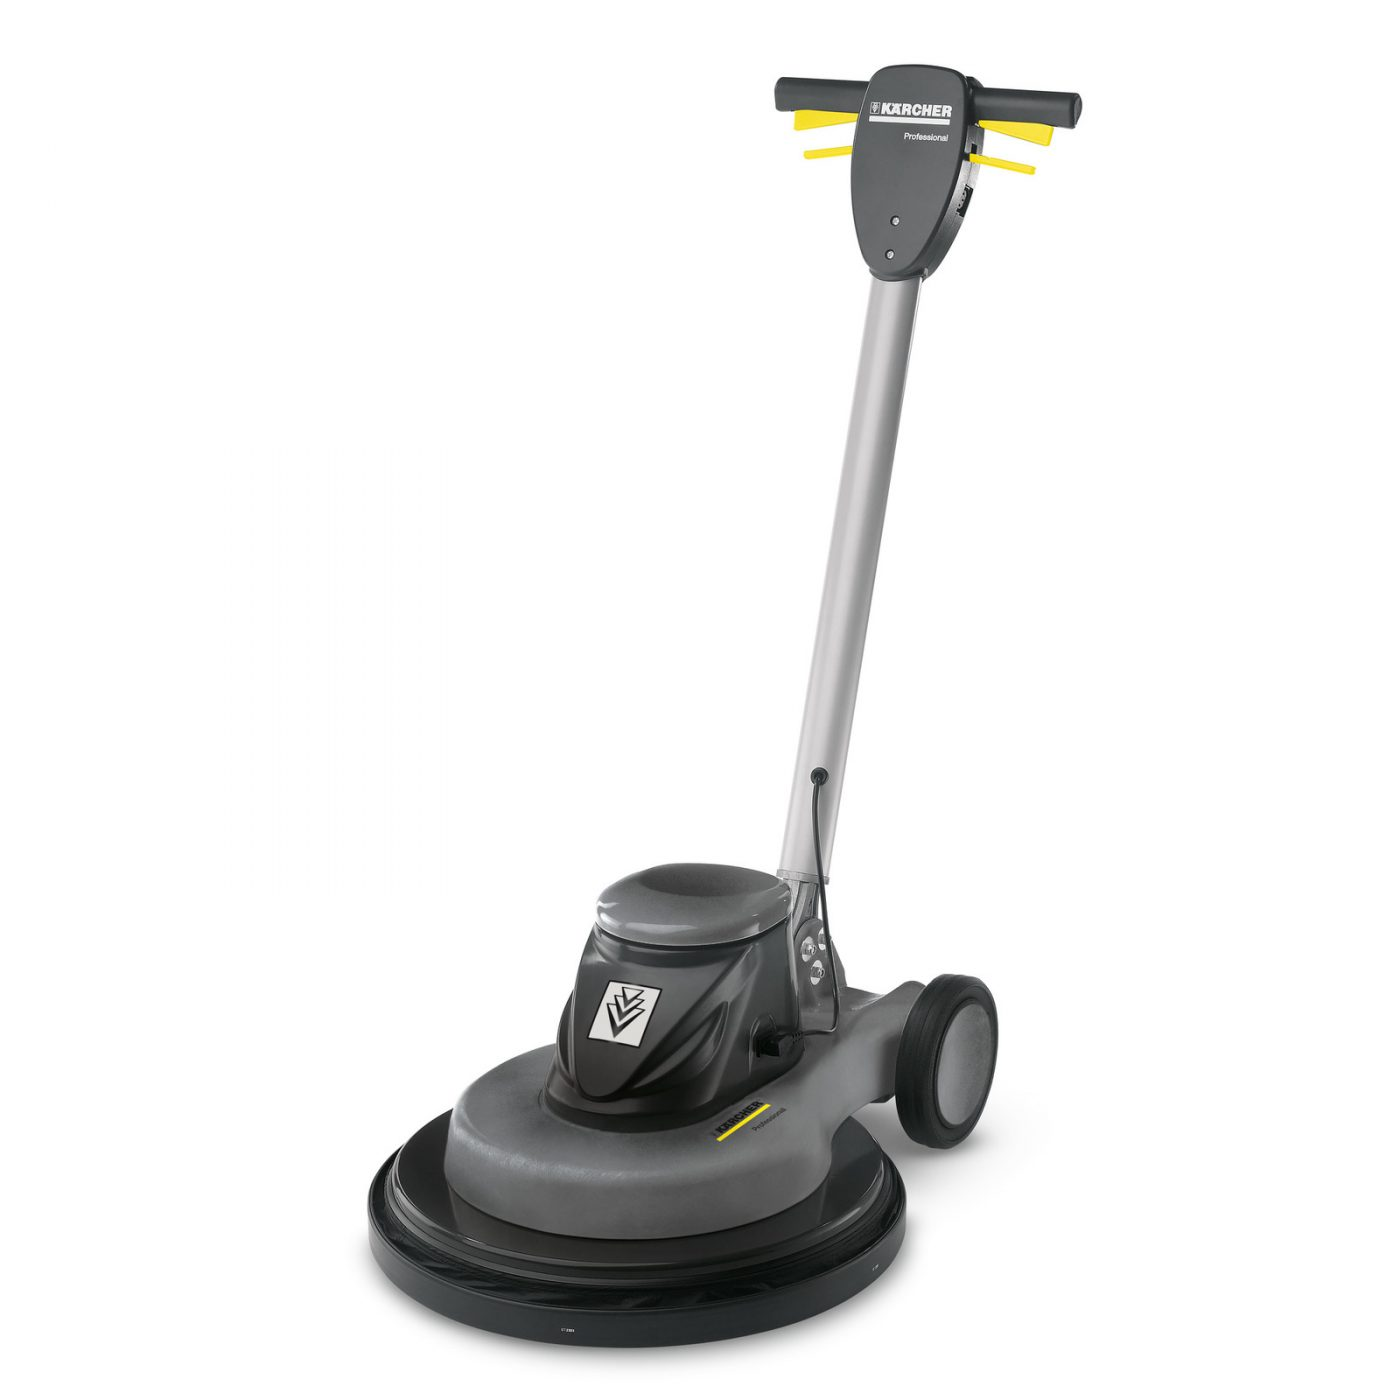 Karcher_1.291-141.0_BDP-50-1500 Scrubber